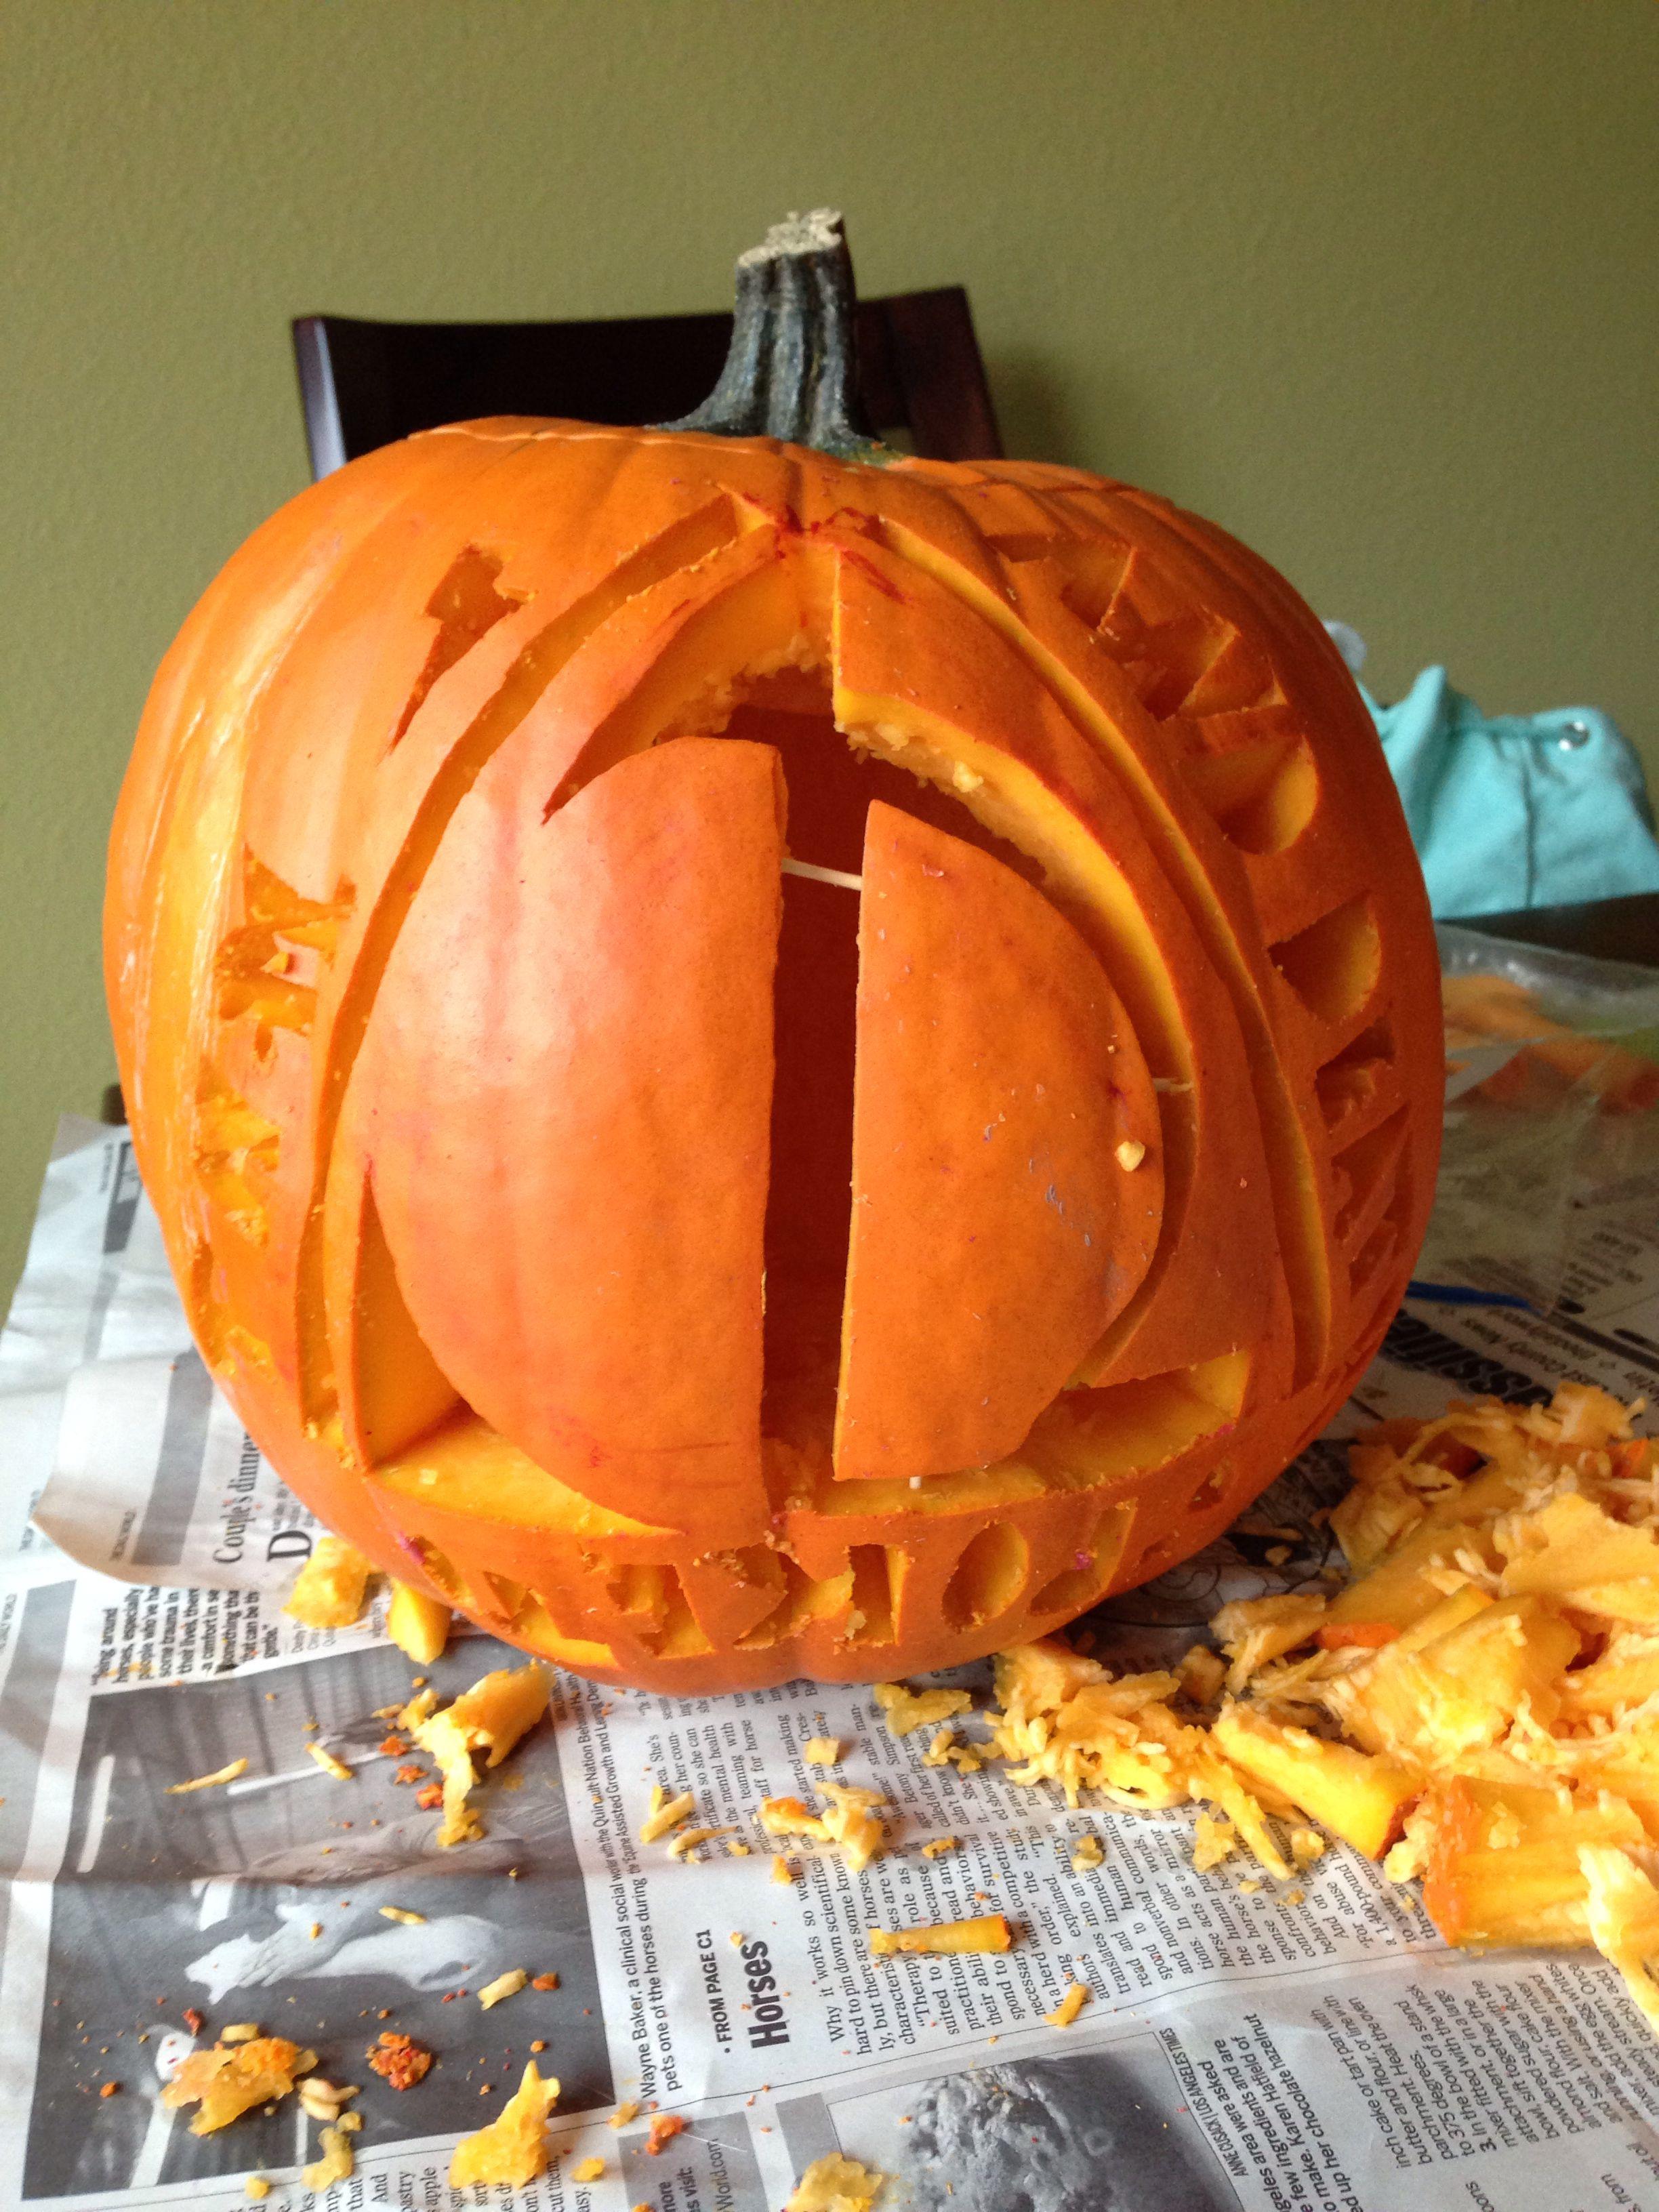 Pin By Kiana Ballo On Beautiful Random Things Homemade Halloween Decorations Harry Potter Halloween Pumpkin Carving